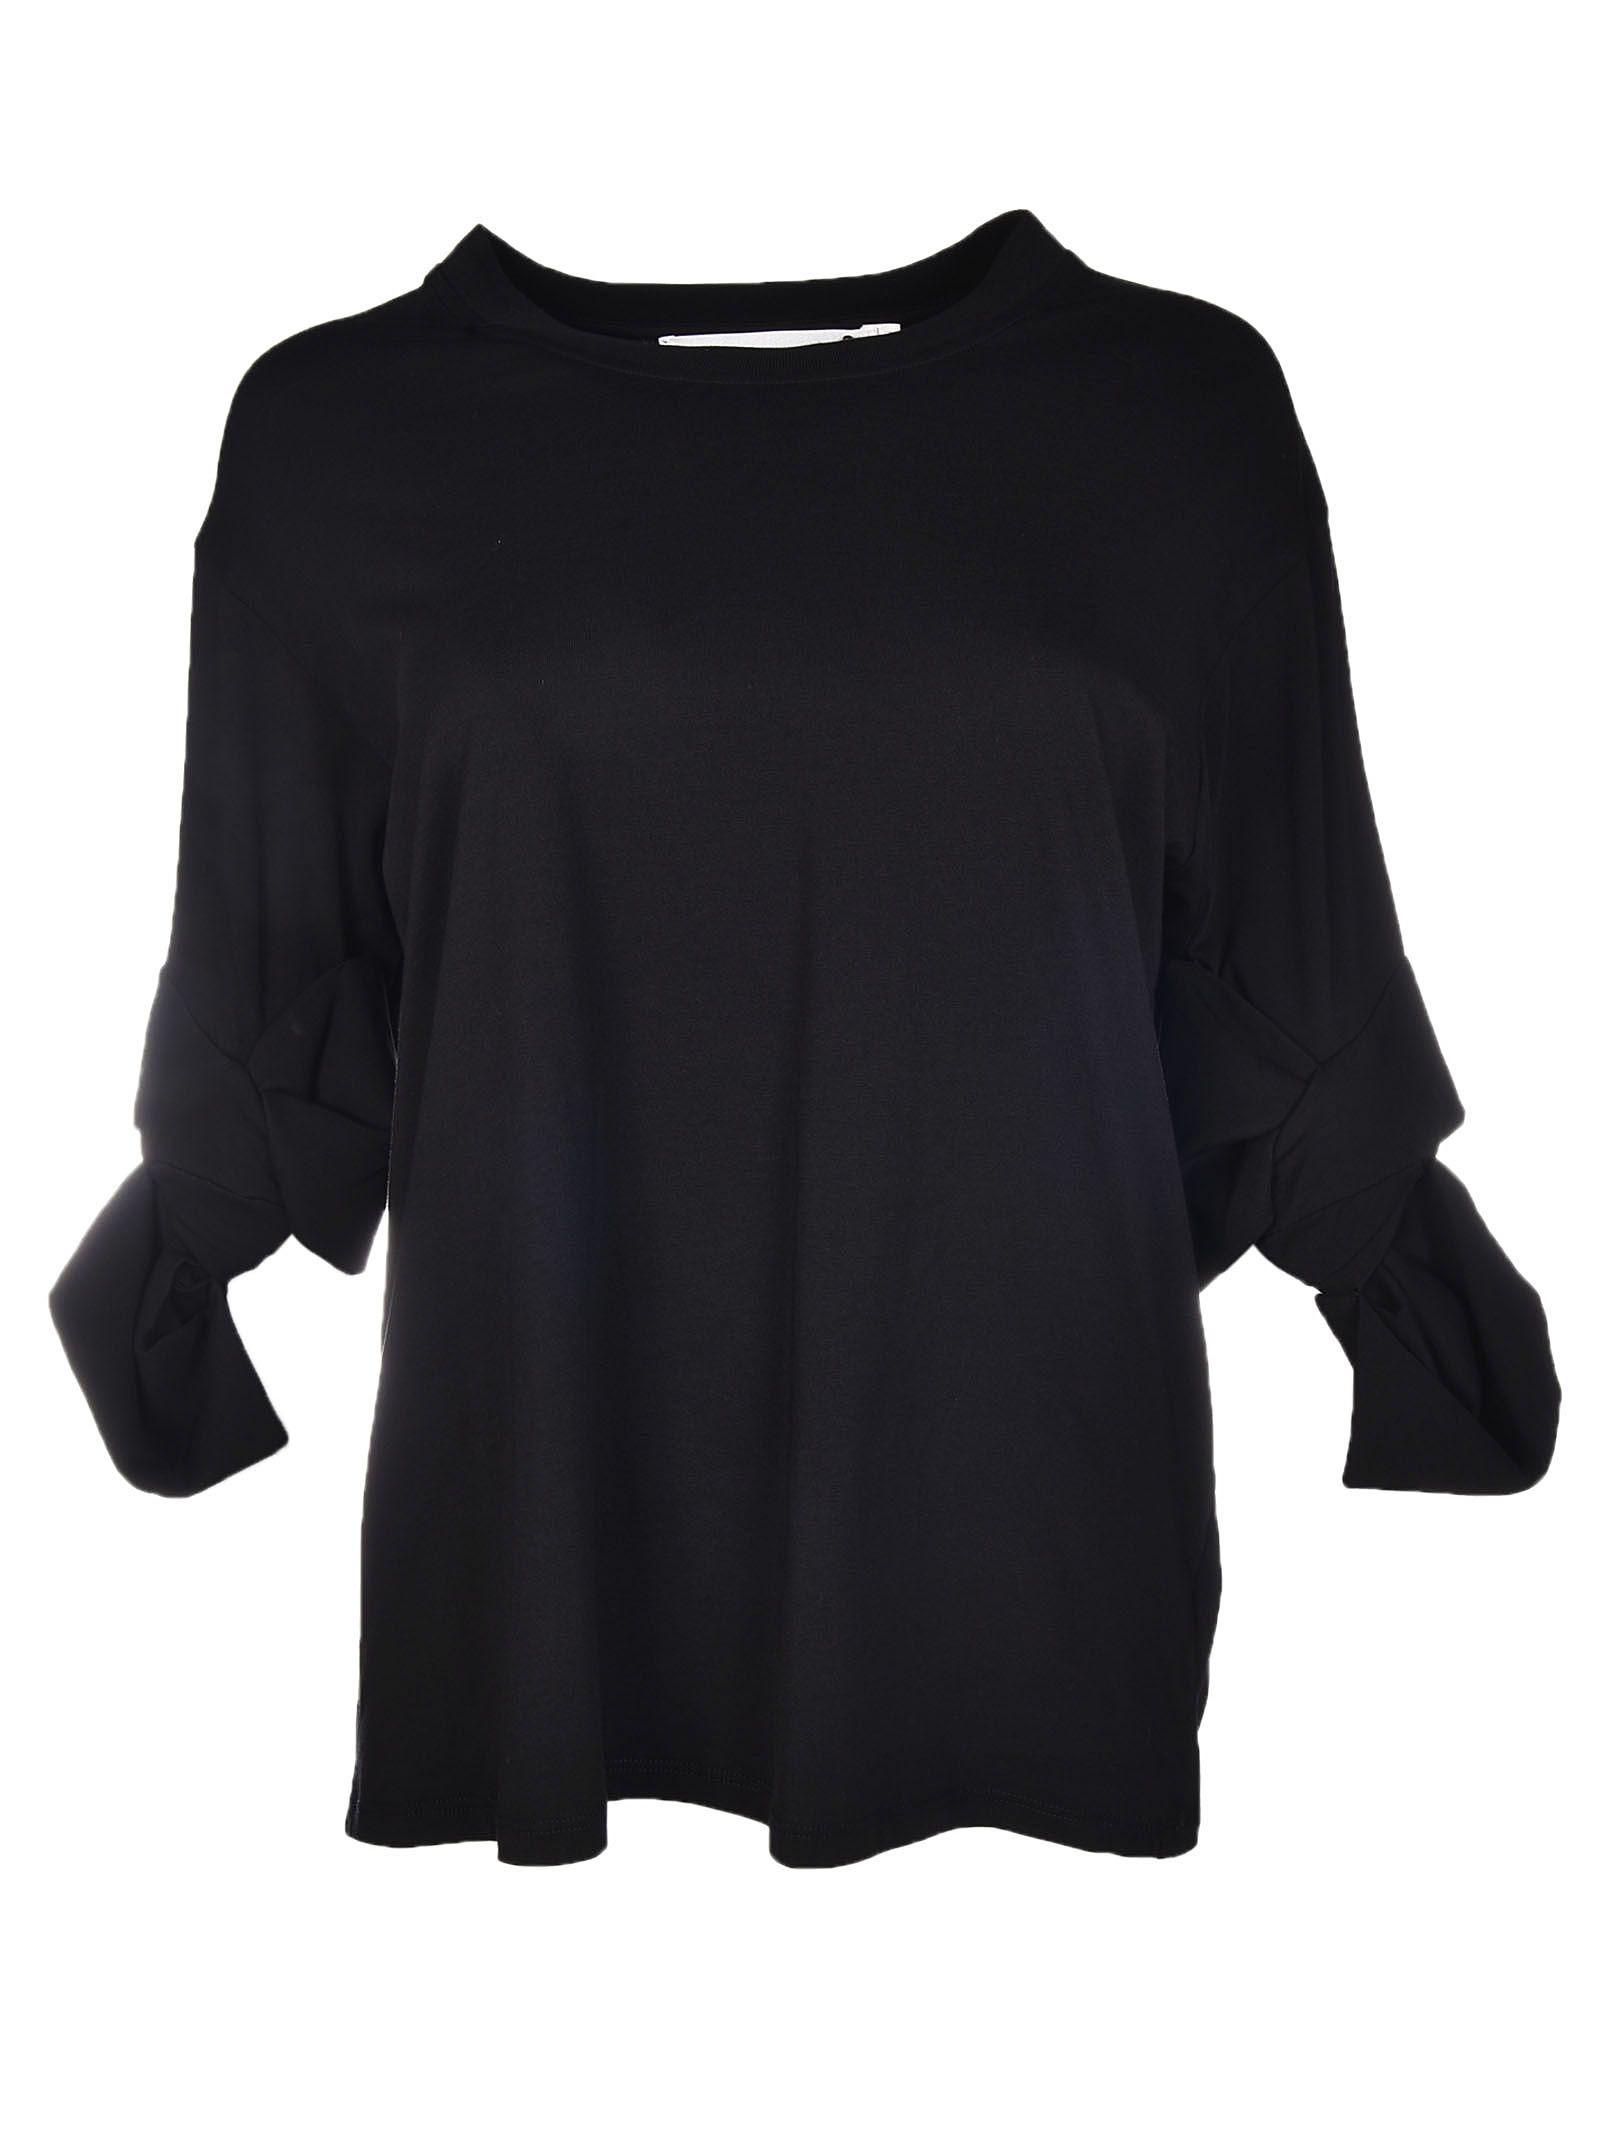 Victoria Victoria Beckham Bow T-shirt